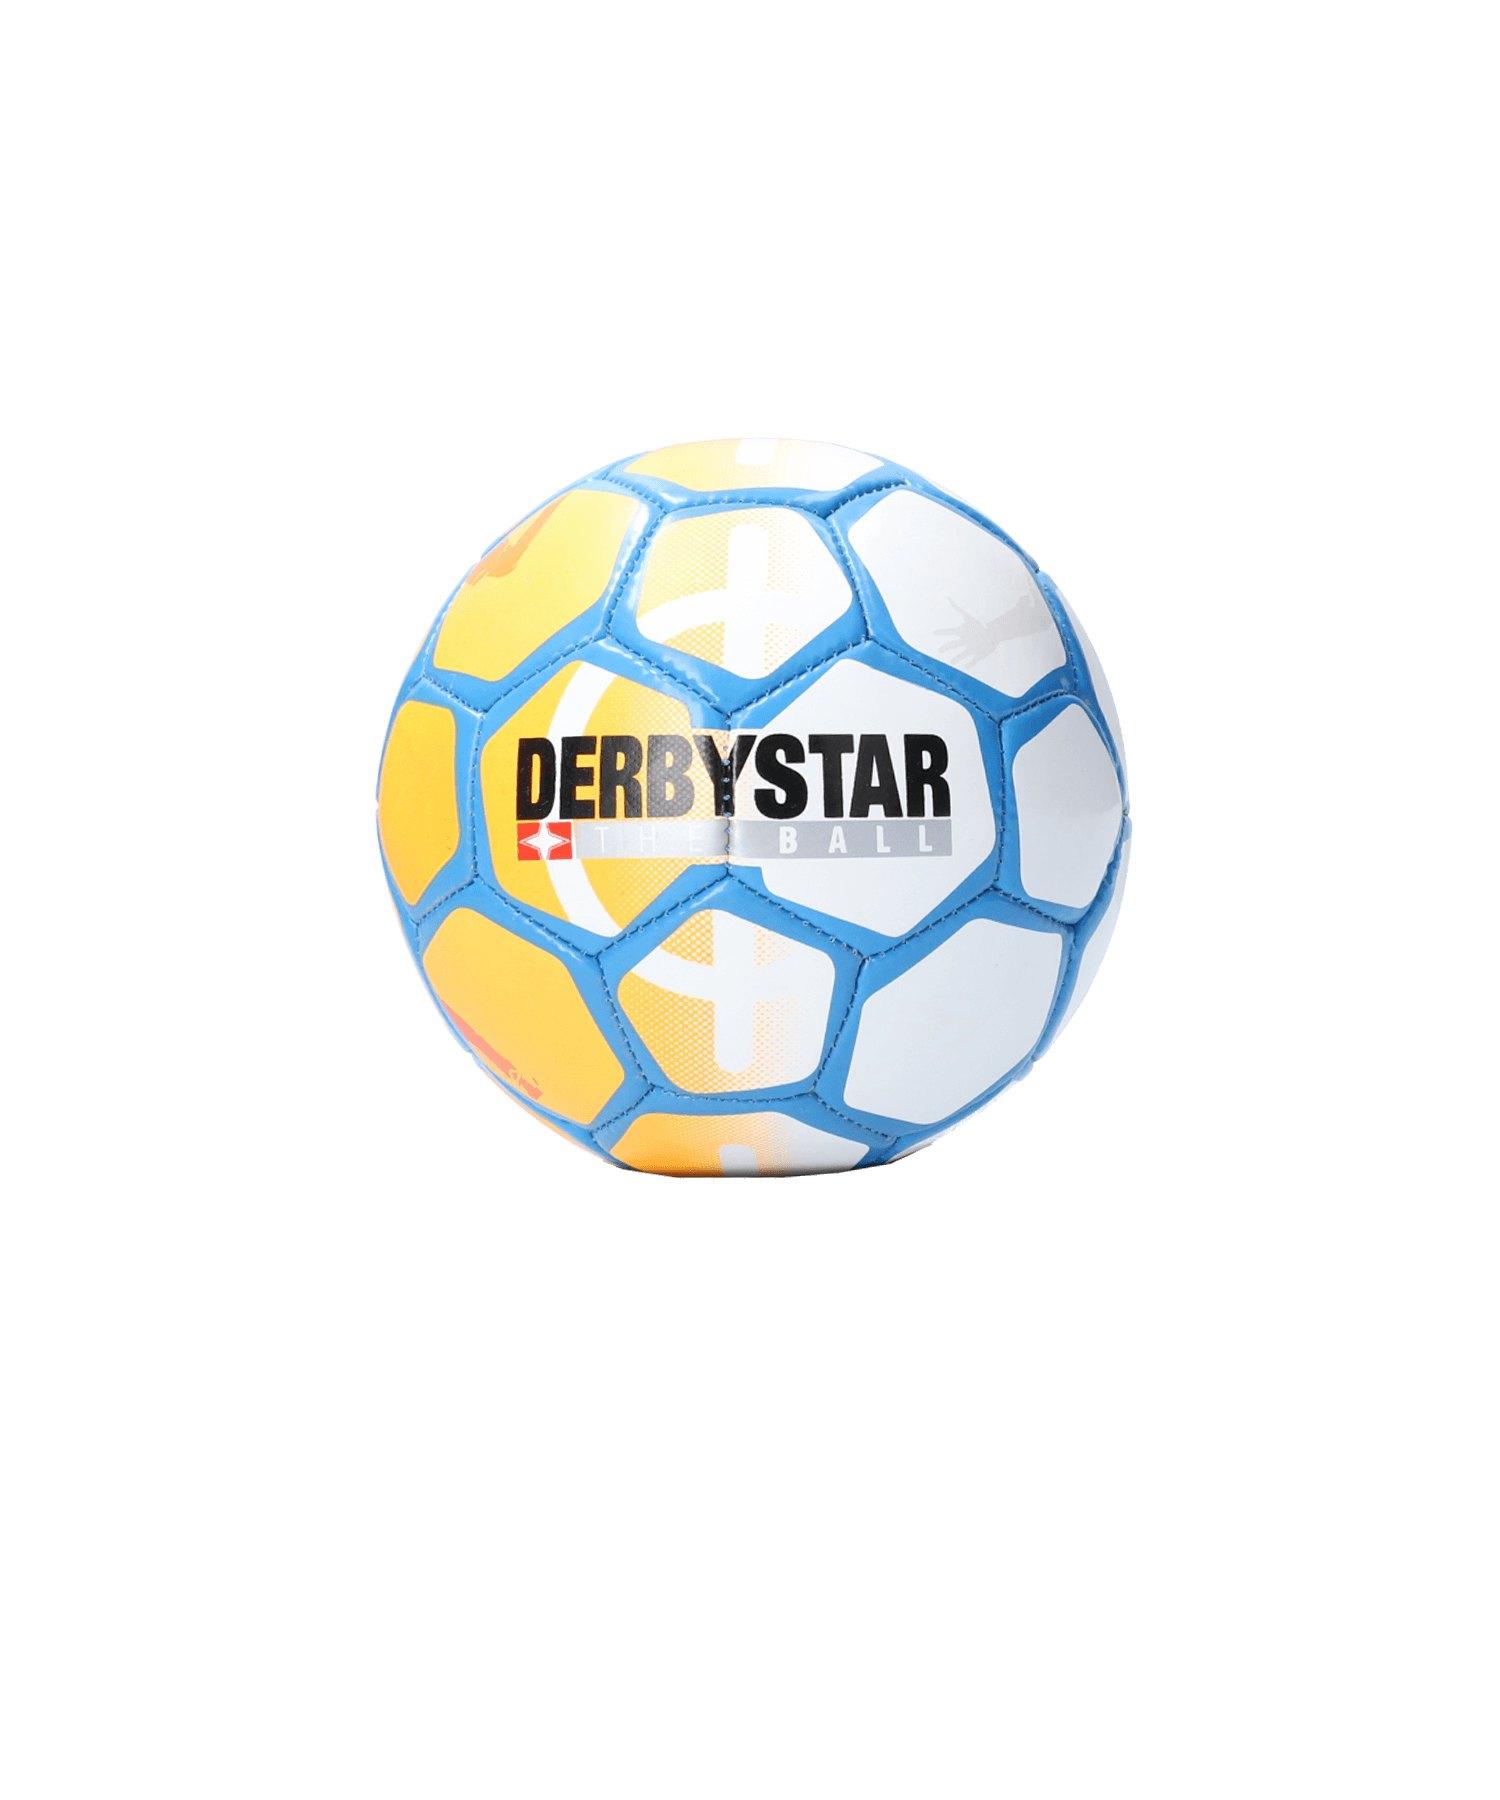 Derbystar Minifussball Street Soccer Orange F716 - orange